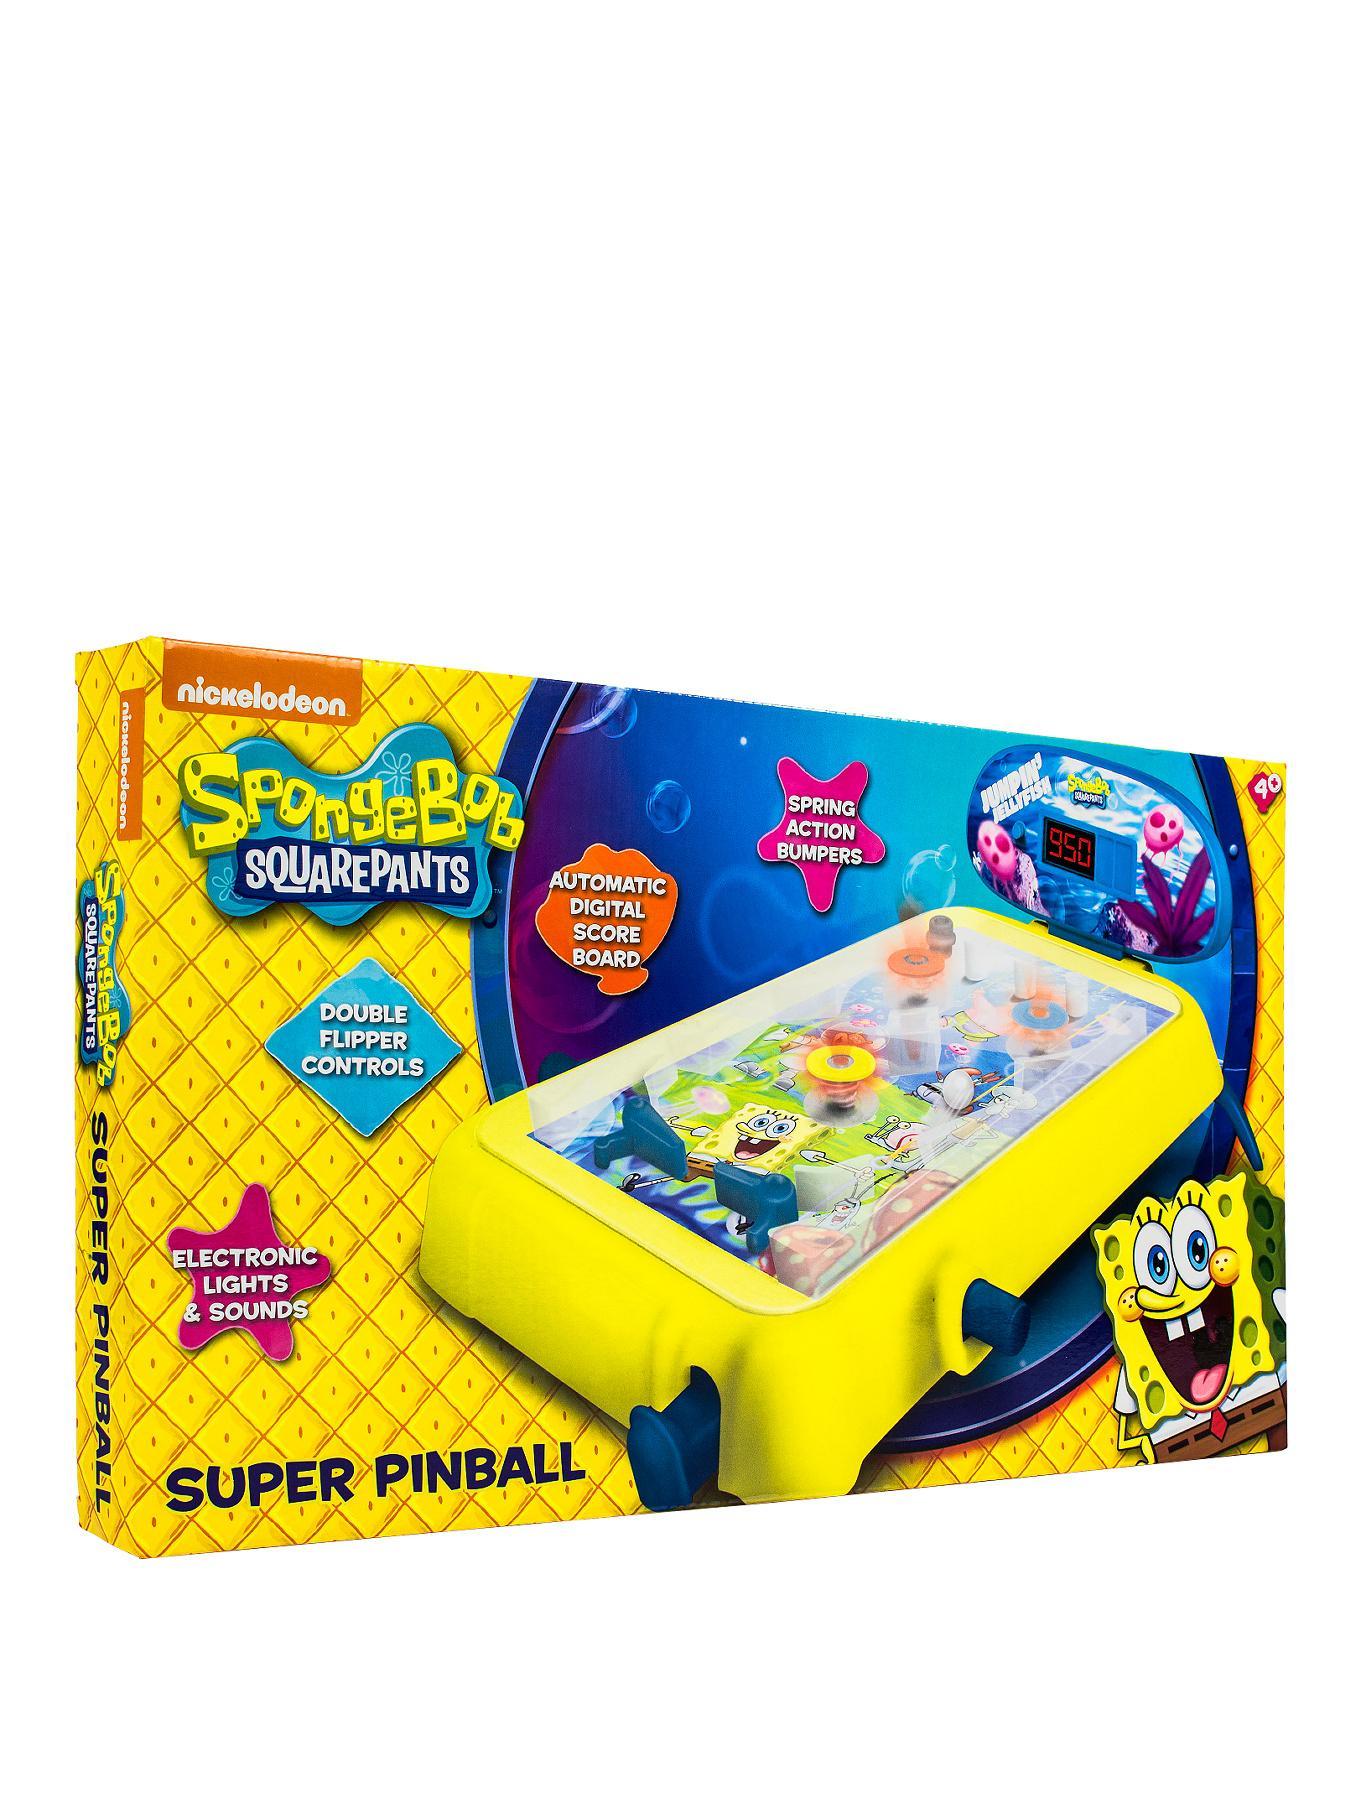 Spongebob Squarepants Medium Super Pinball